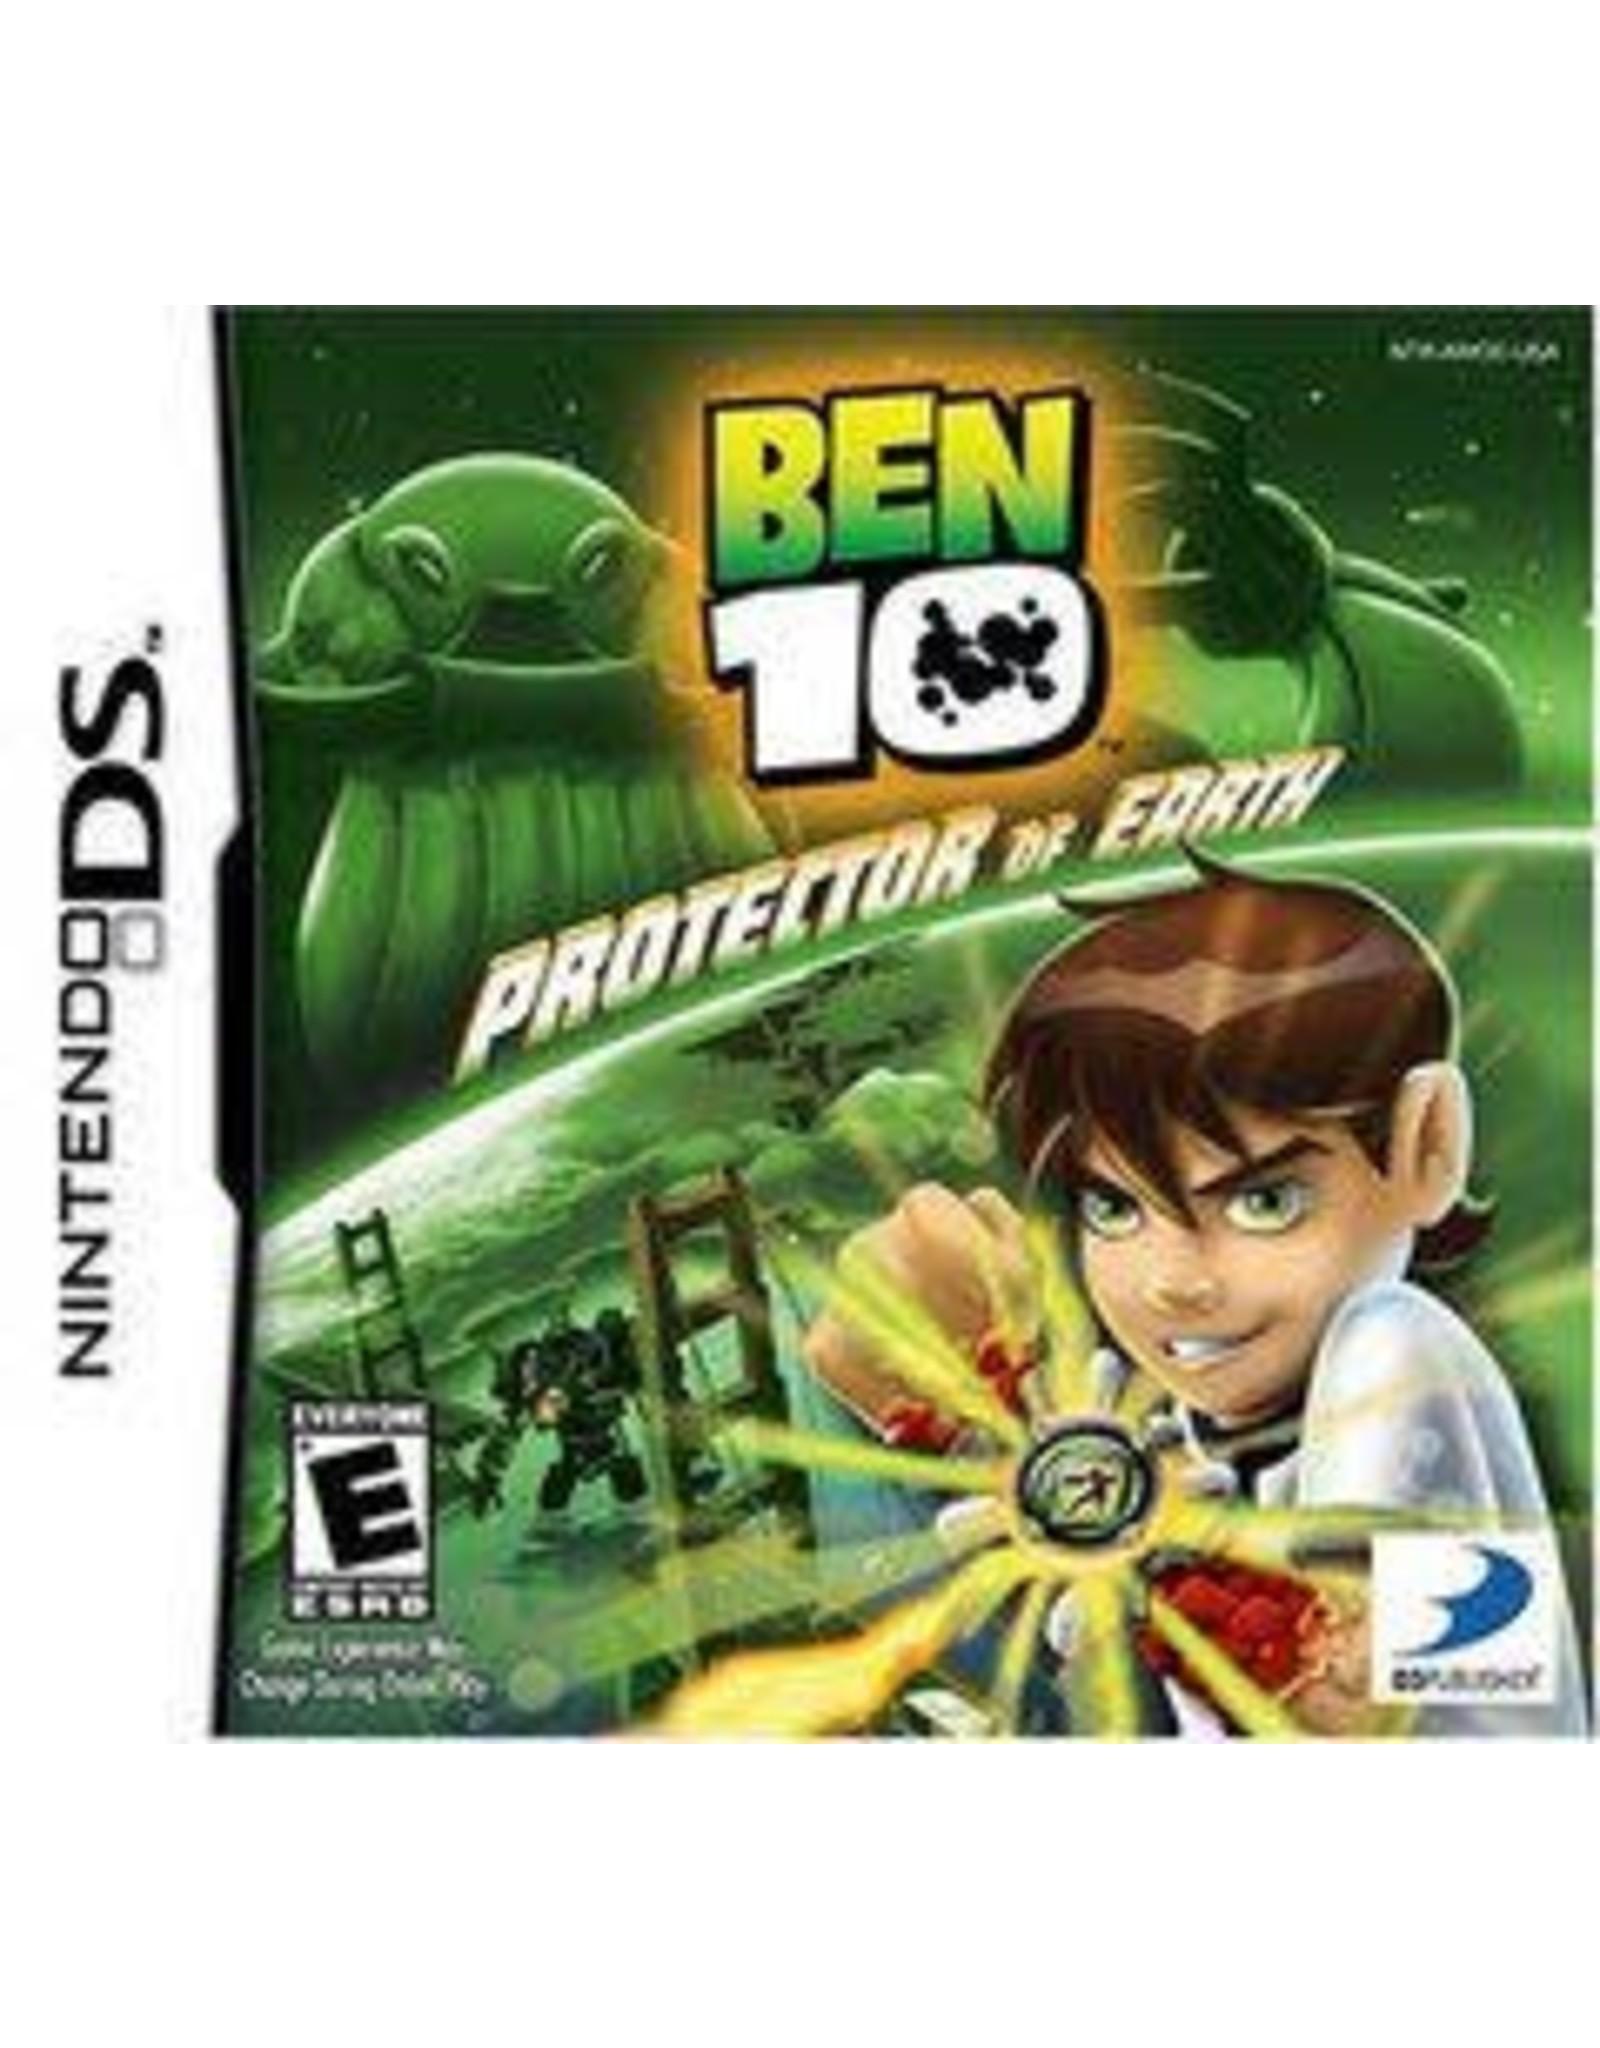 Nintendo DS Ben 10 Protector of Earth (CiB)